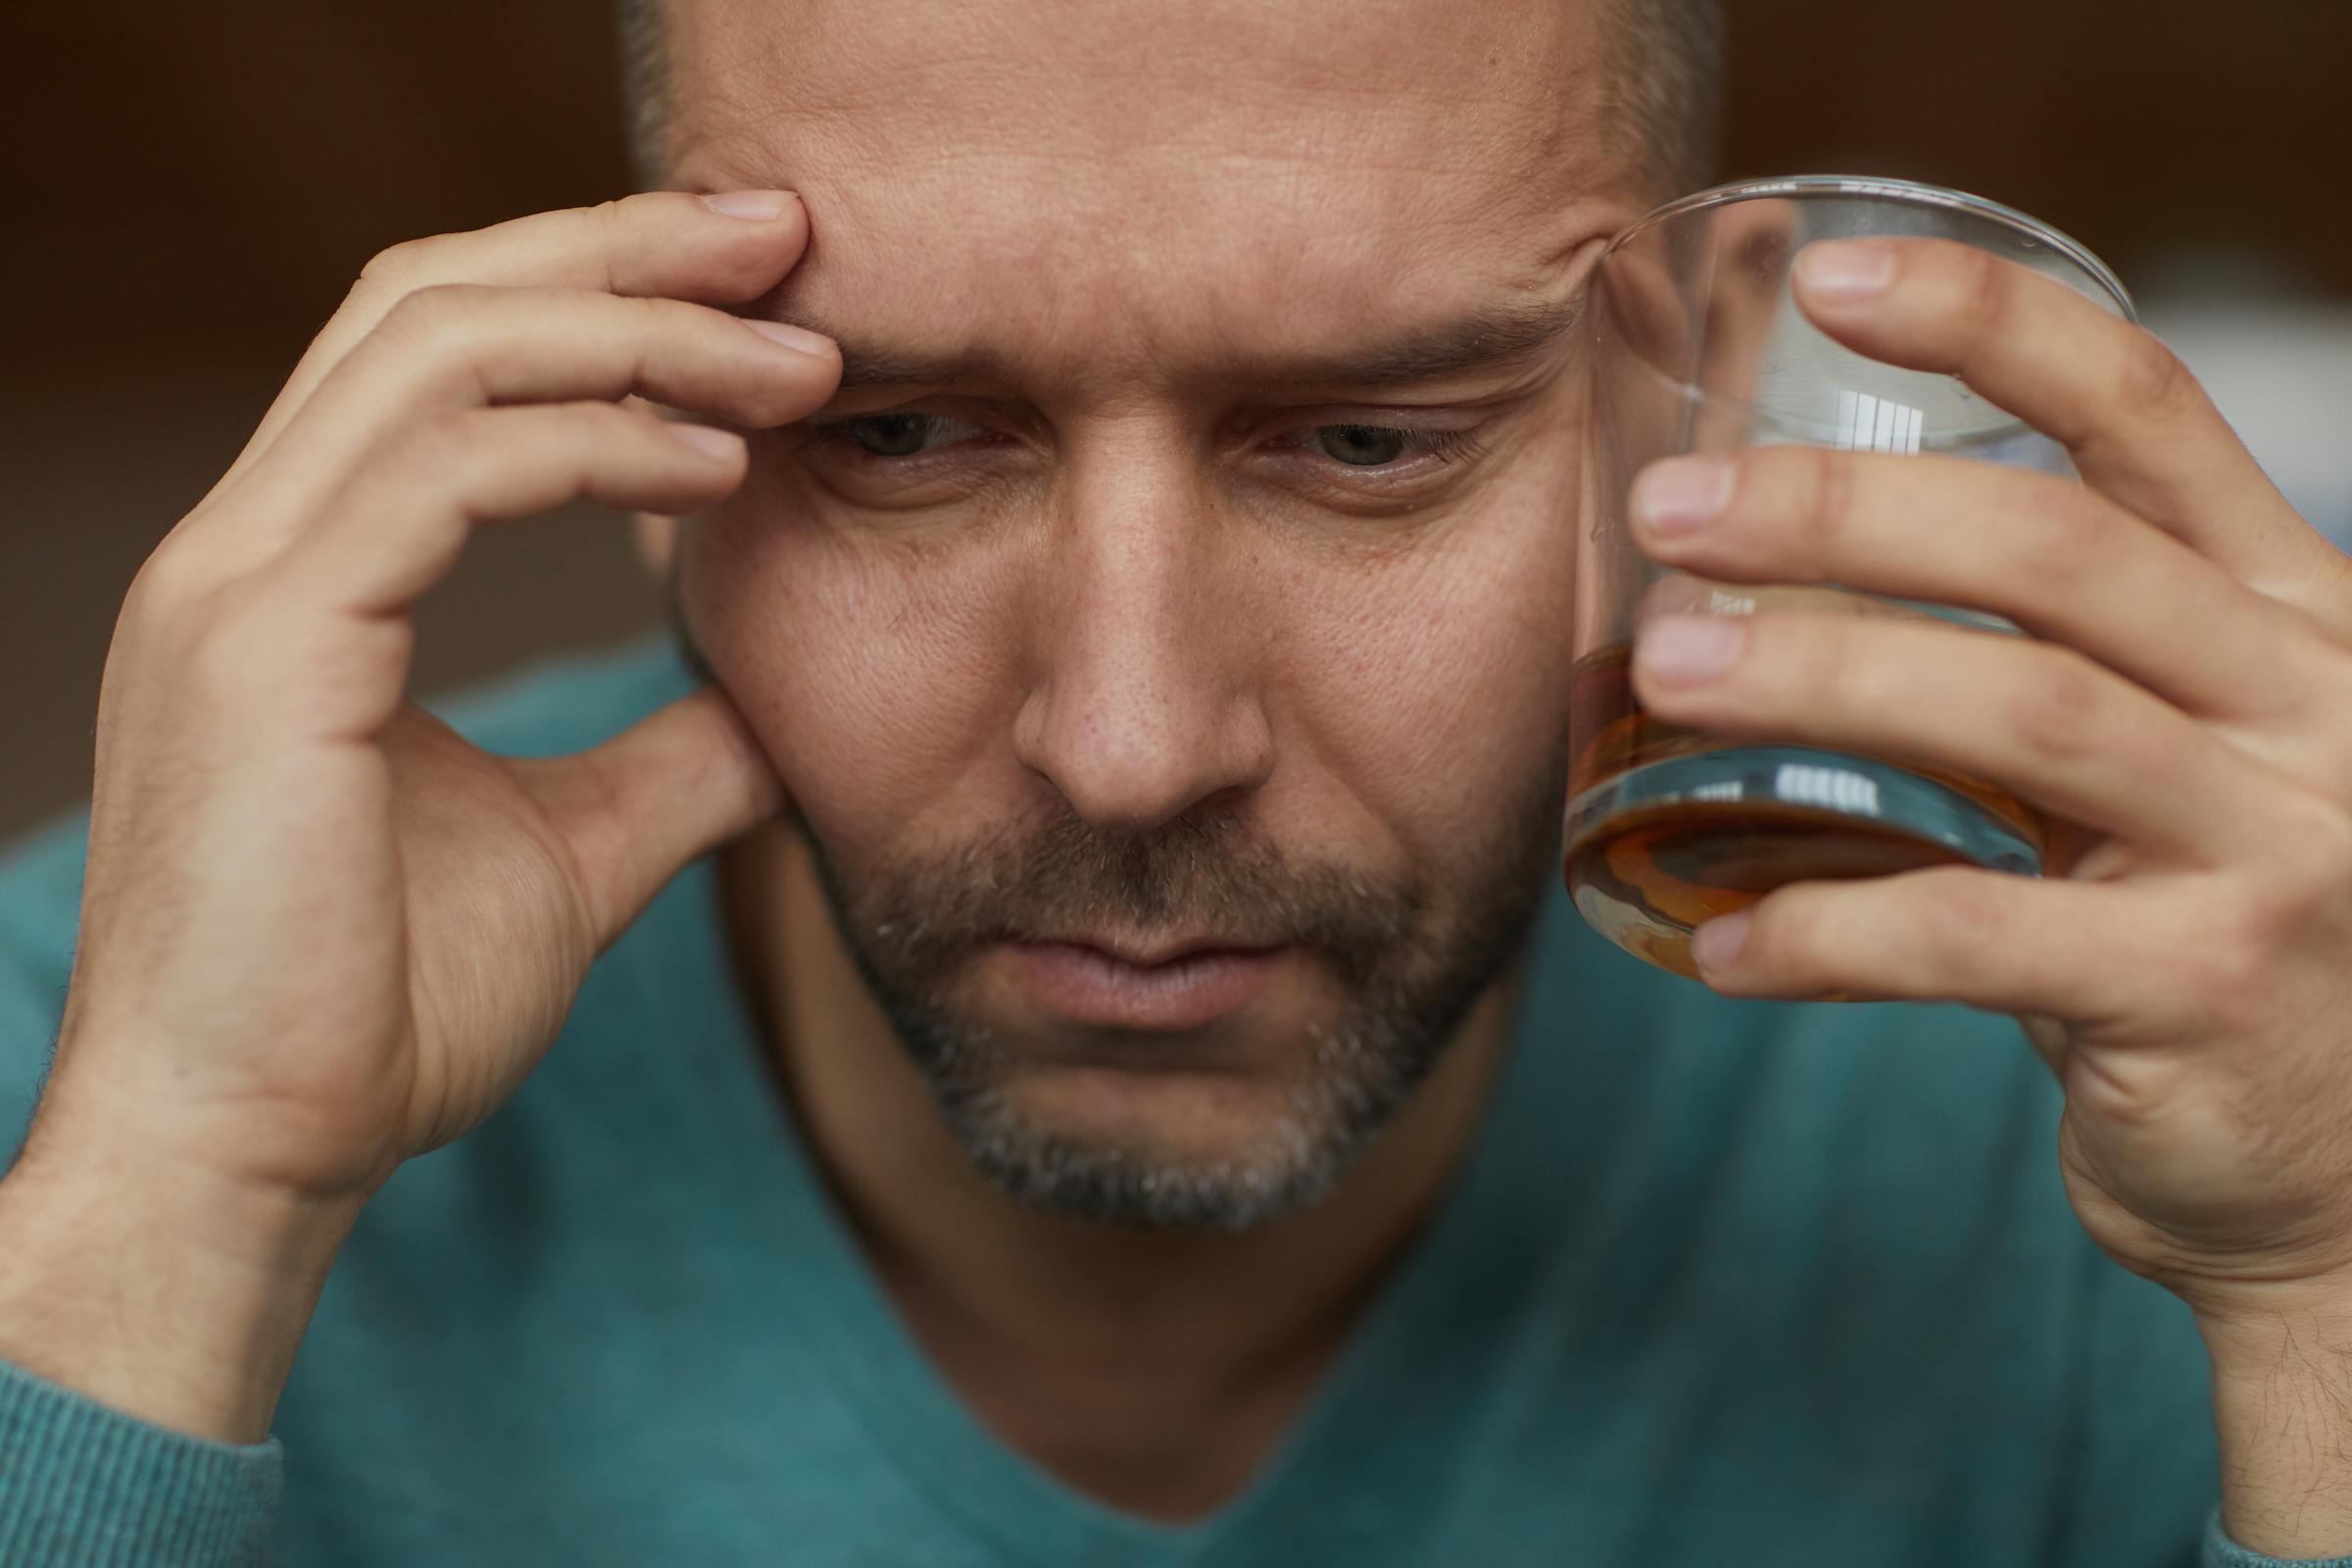 man drinking alcohol GFZM47M